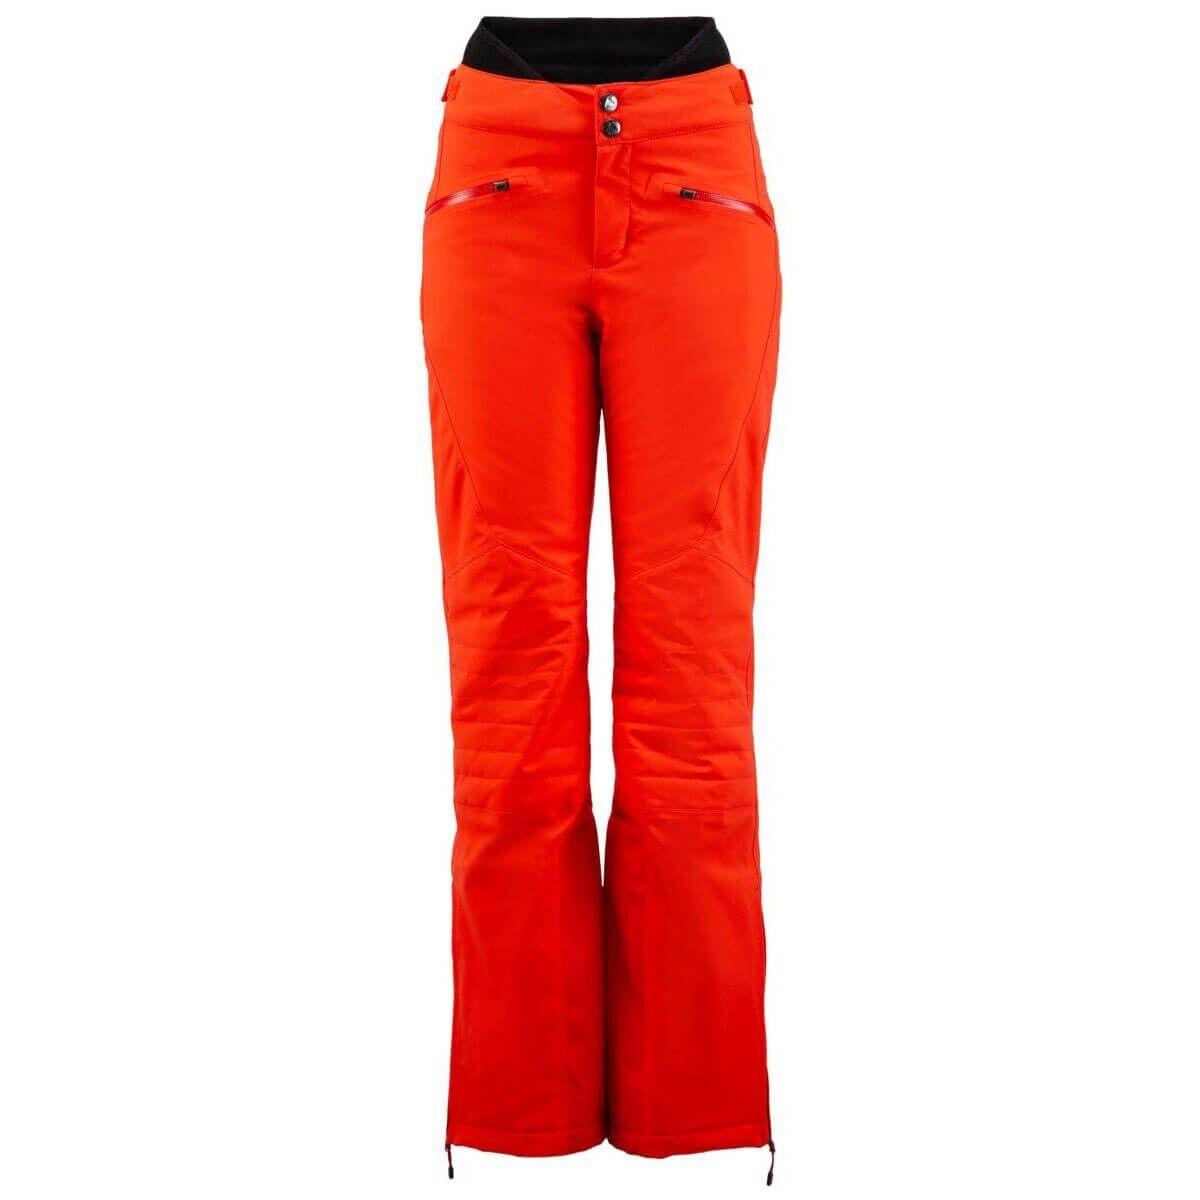 Spyder Echo GTX Pants Damen Skihose orange